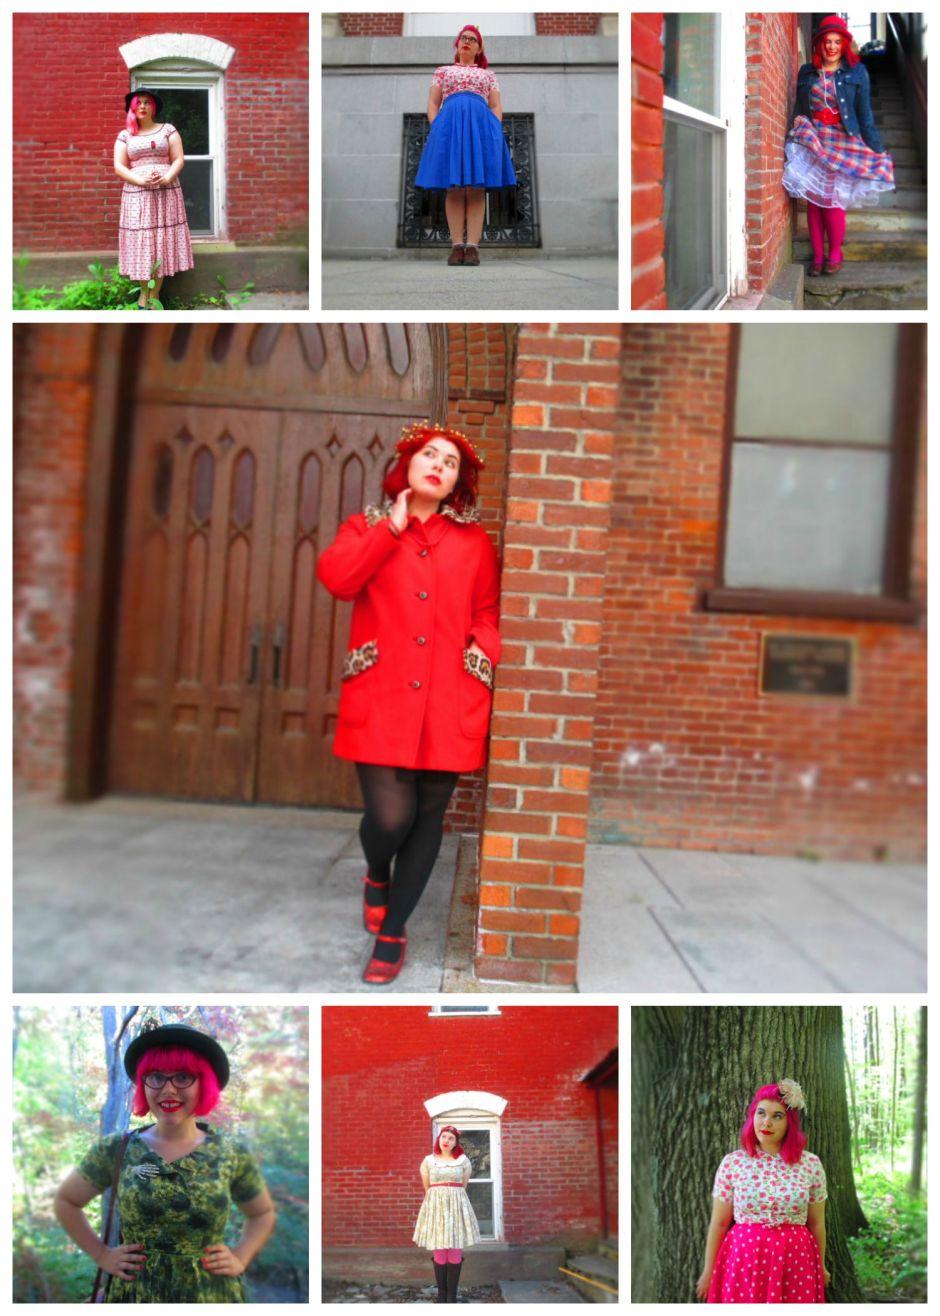 bsj collage